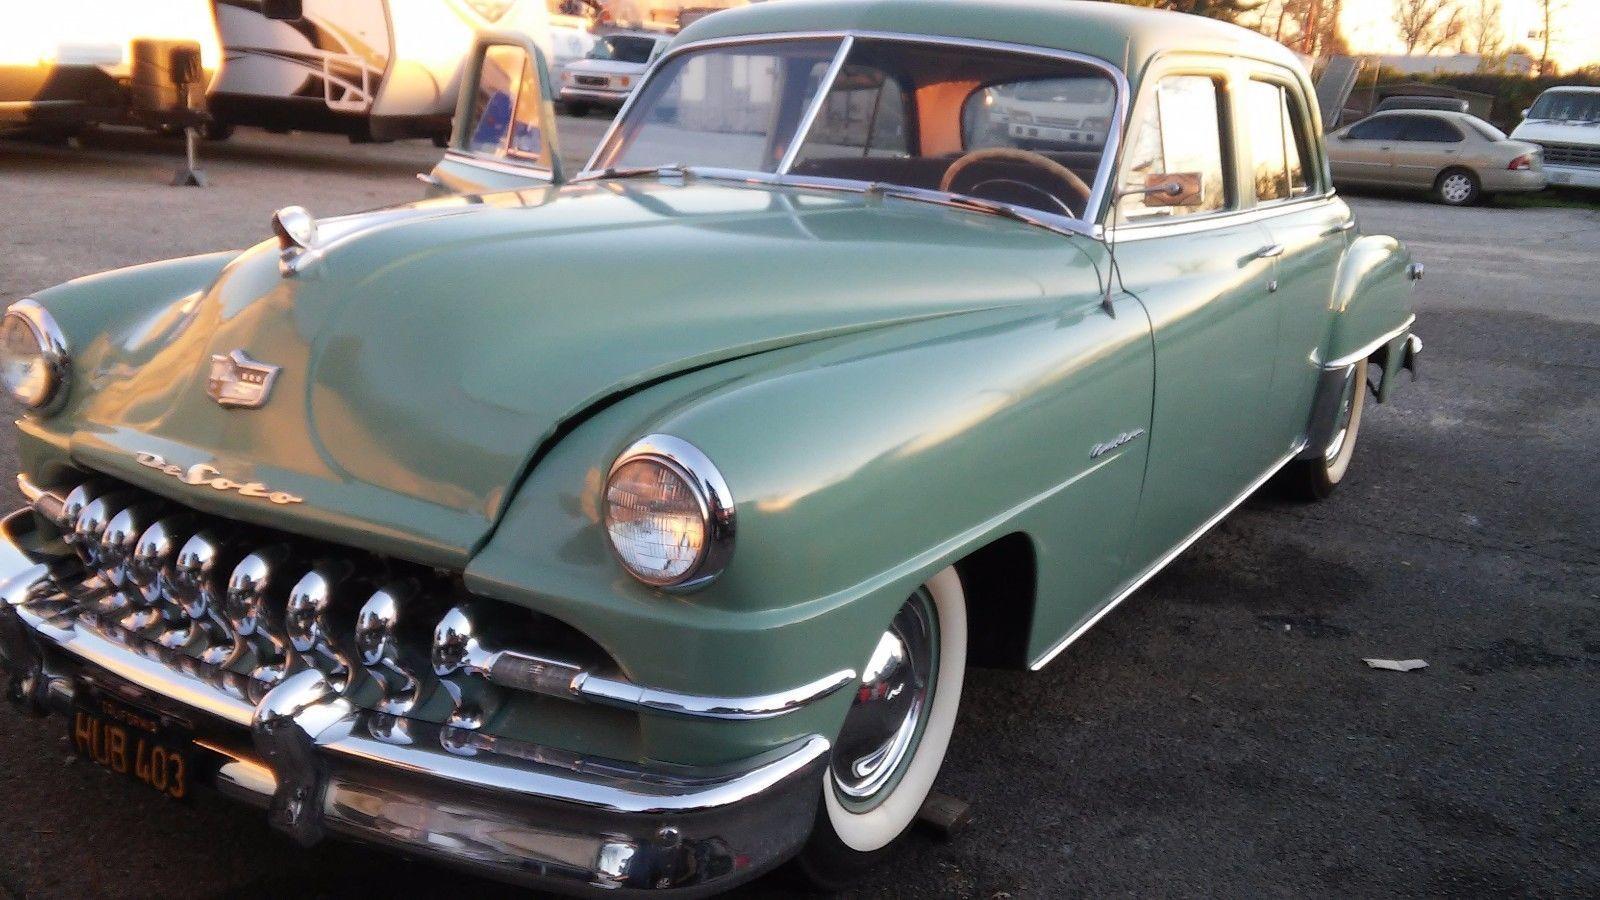 1951 DeSoto Deluxe   eBay   DeSoto   Pinterest   Motor car and Cars